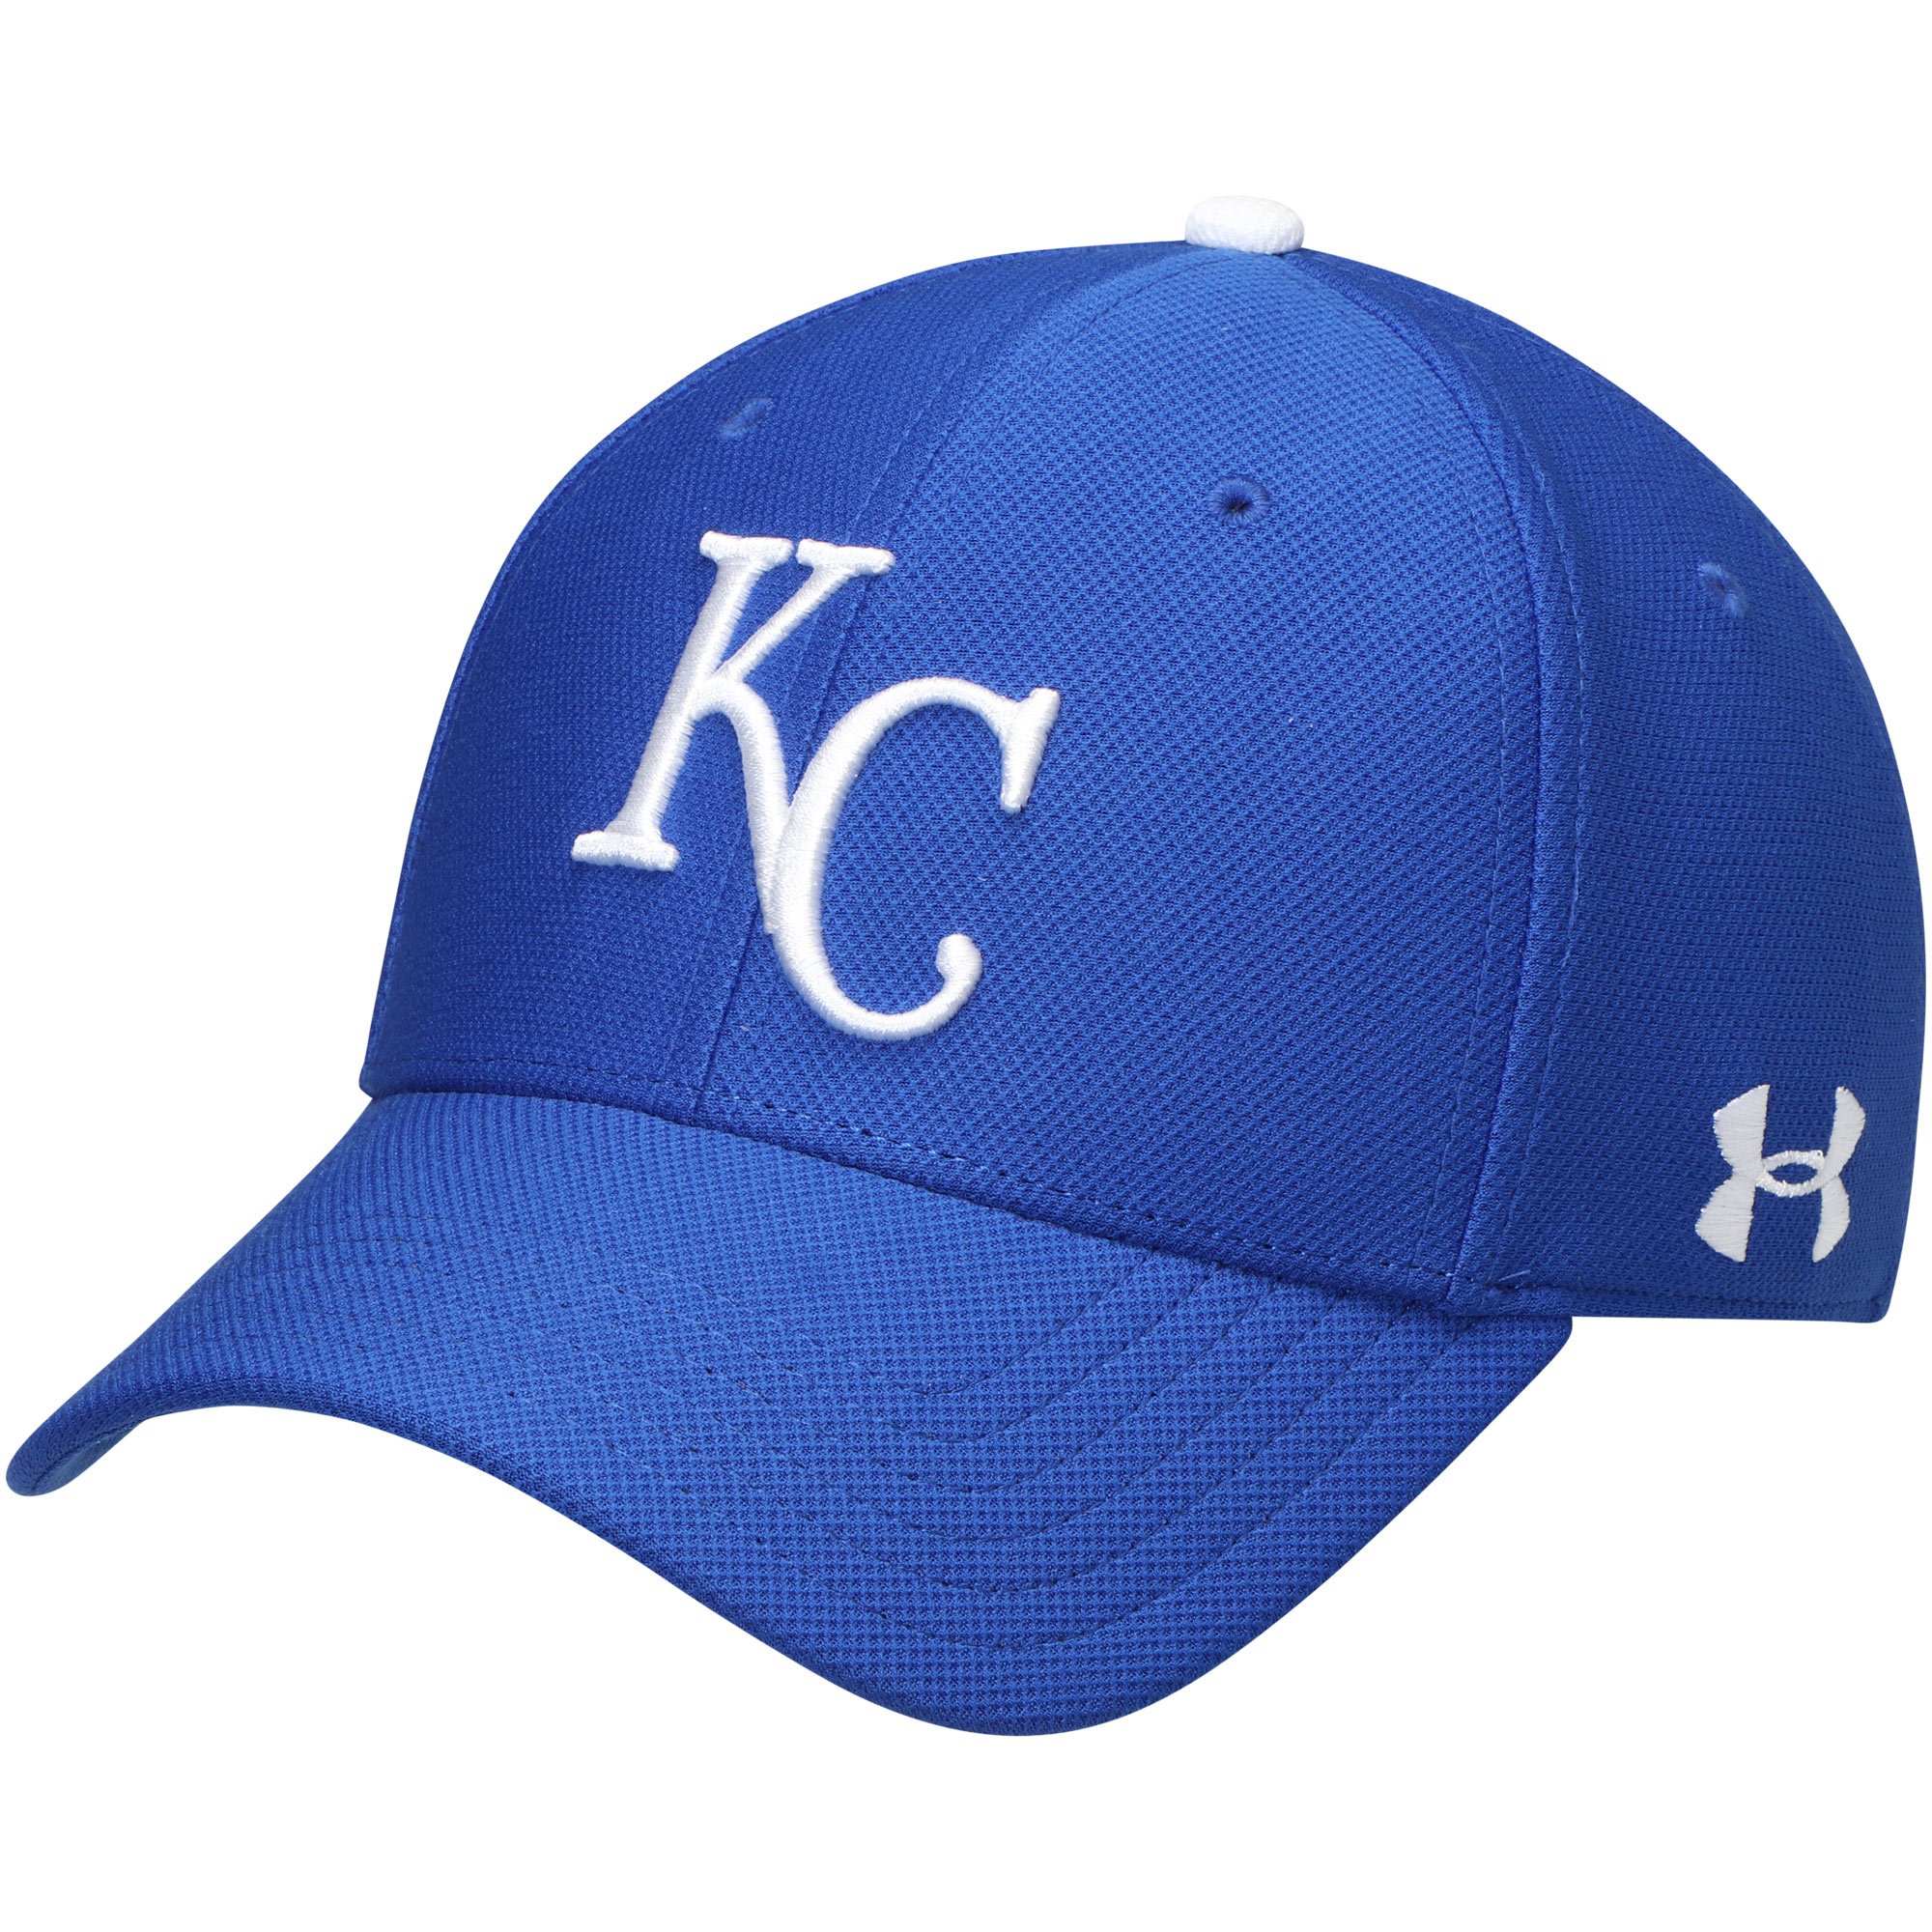 Kansas City Royals Under Armour Blitzing Performance Adjustable Hat - Royal - OSFA